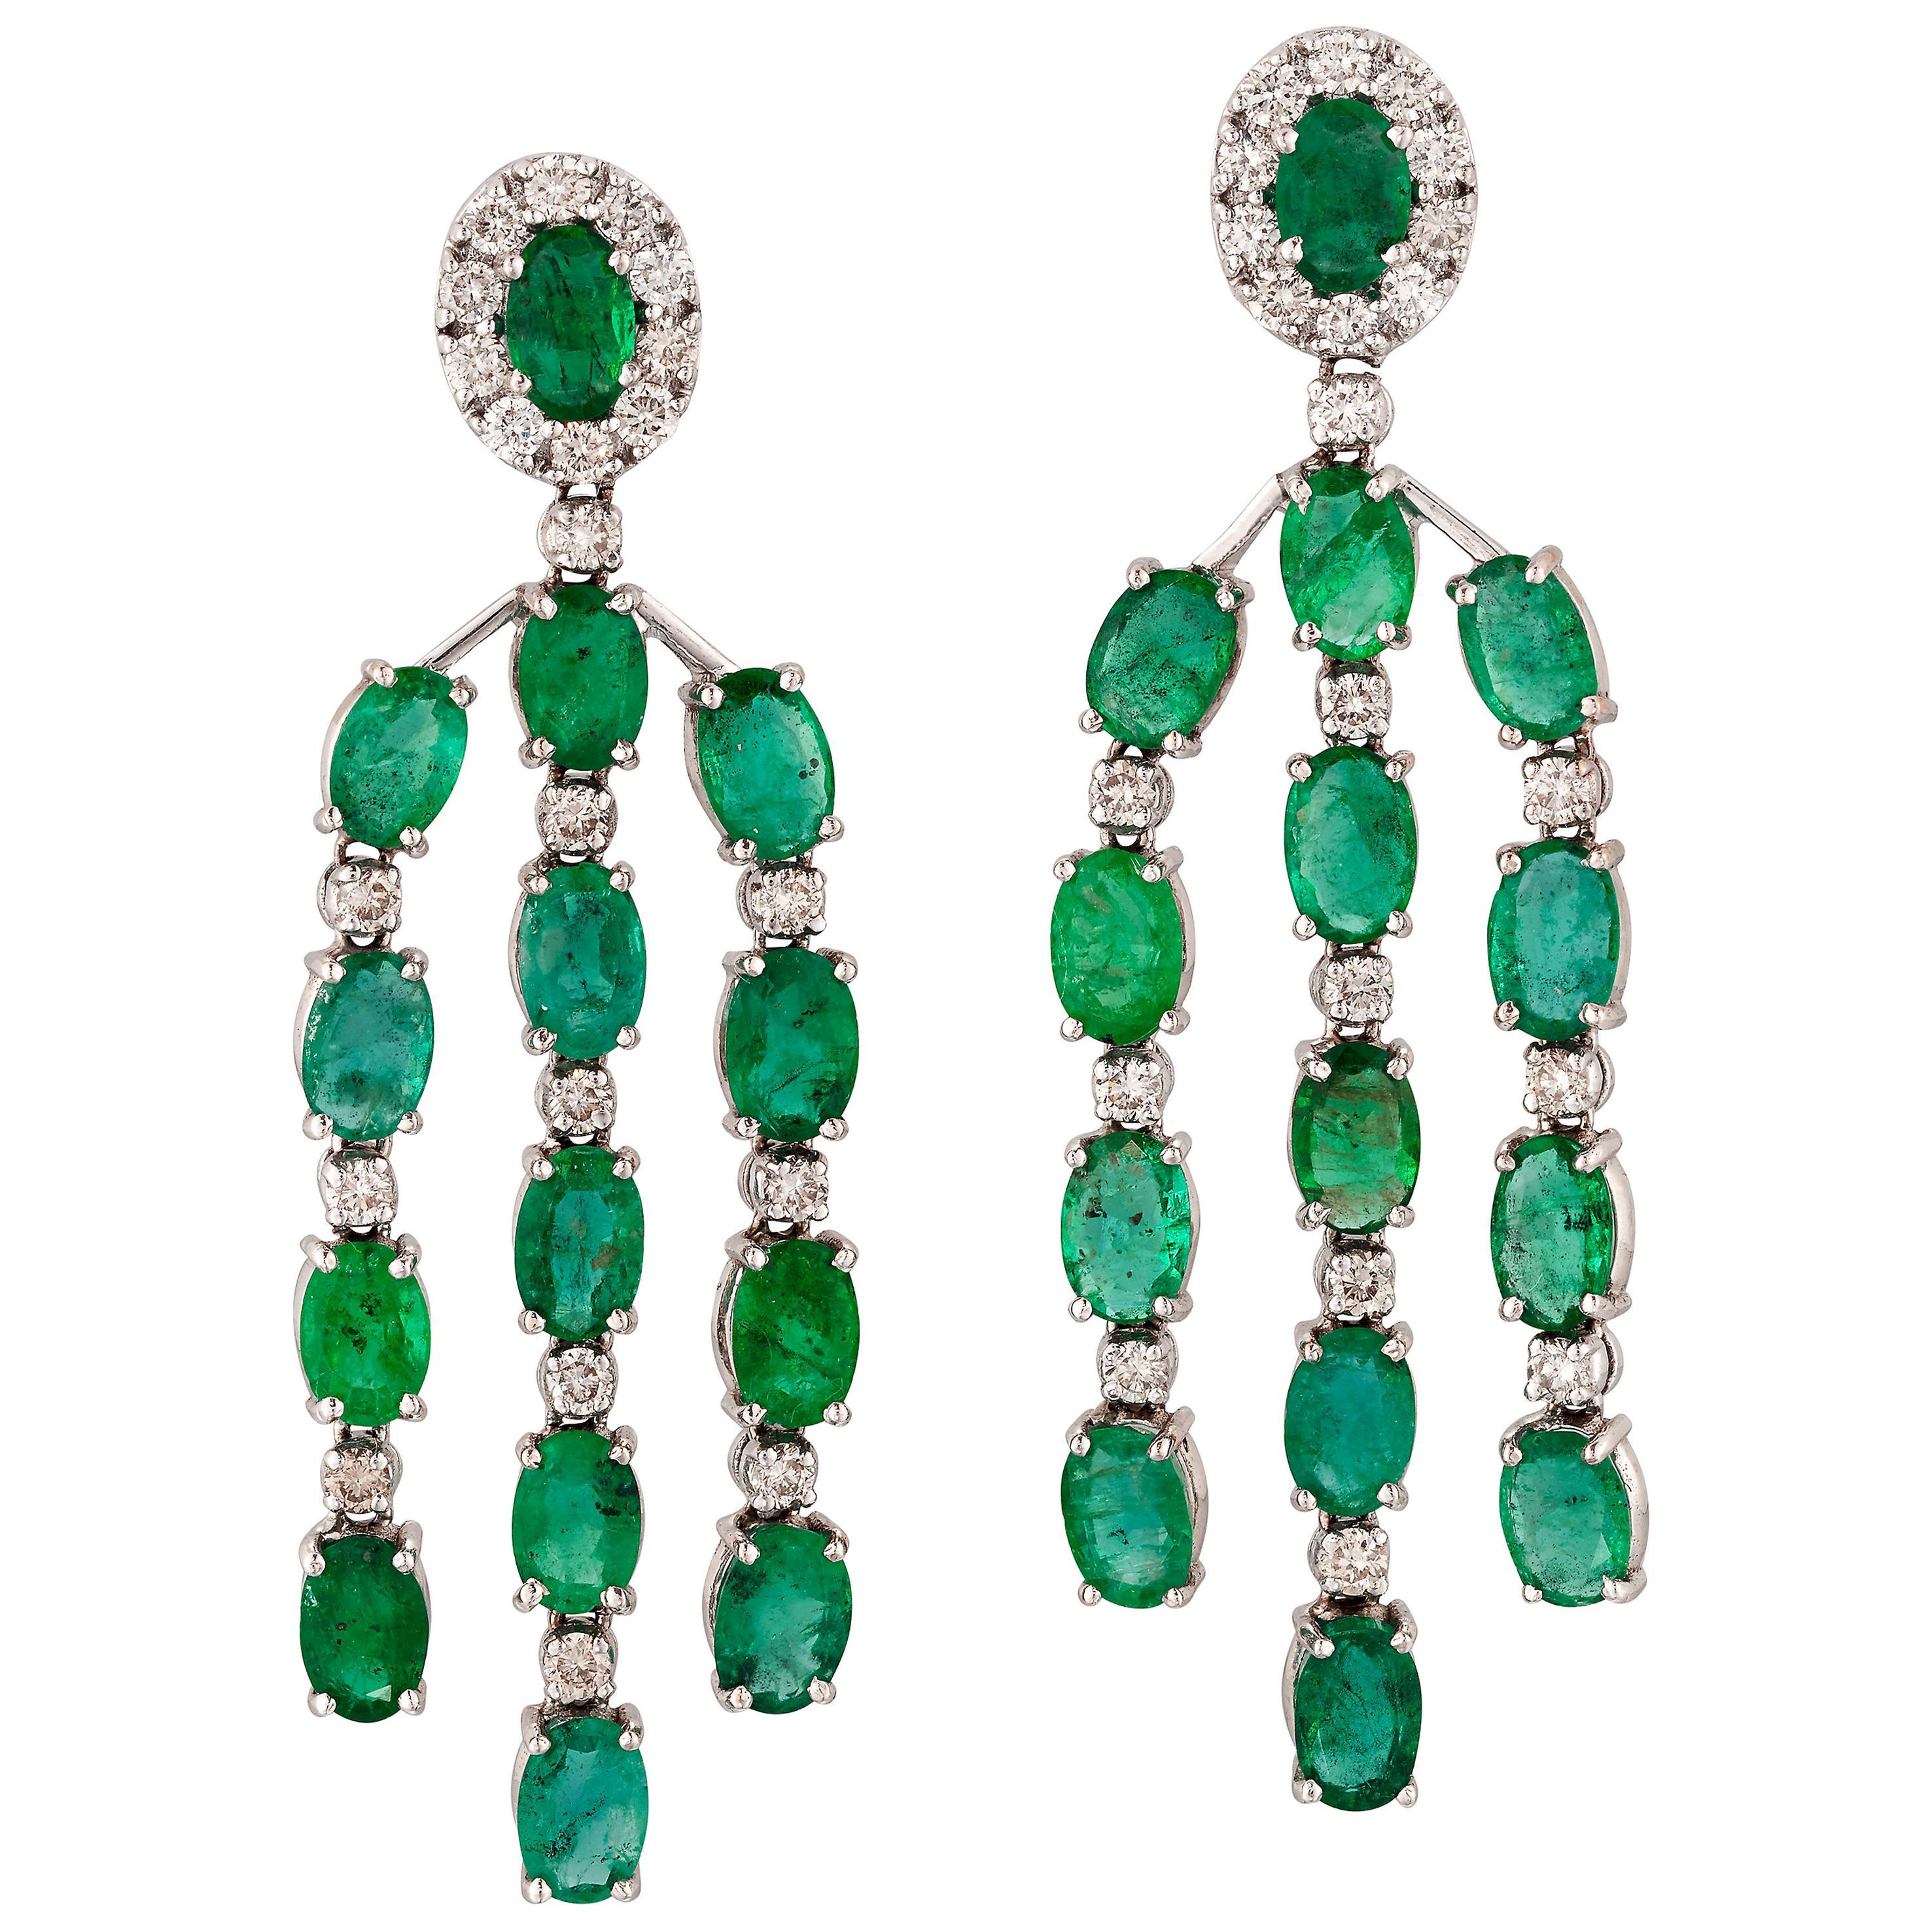 Emerald and Diamond Chandelier Earrings, 18 Carat White Gold, London Marks